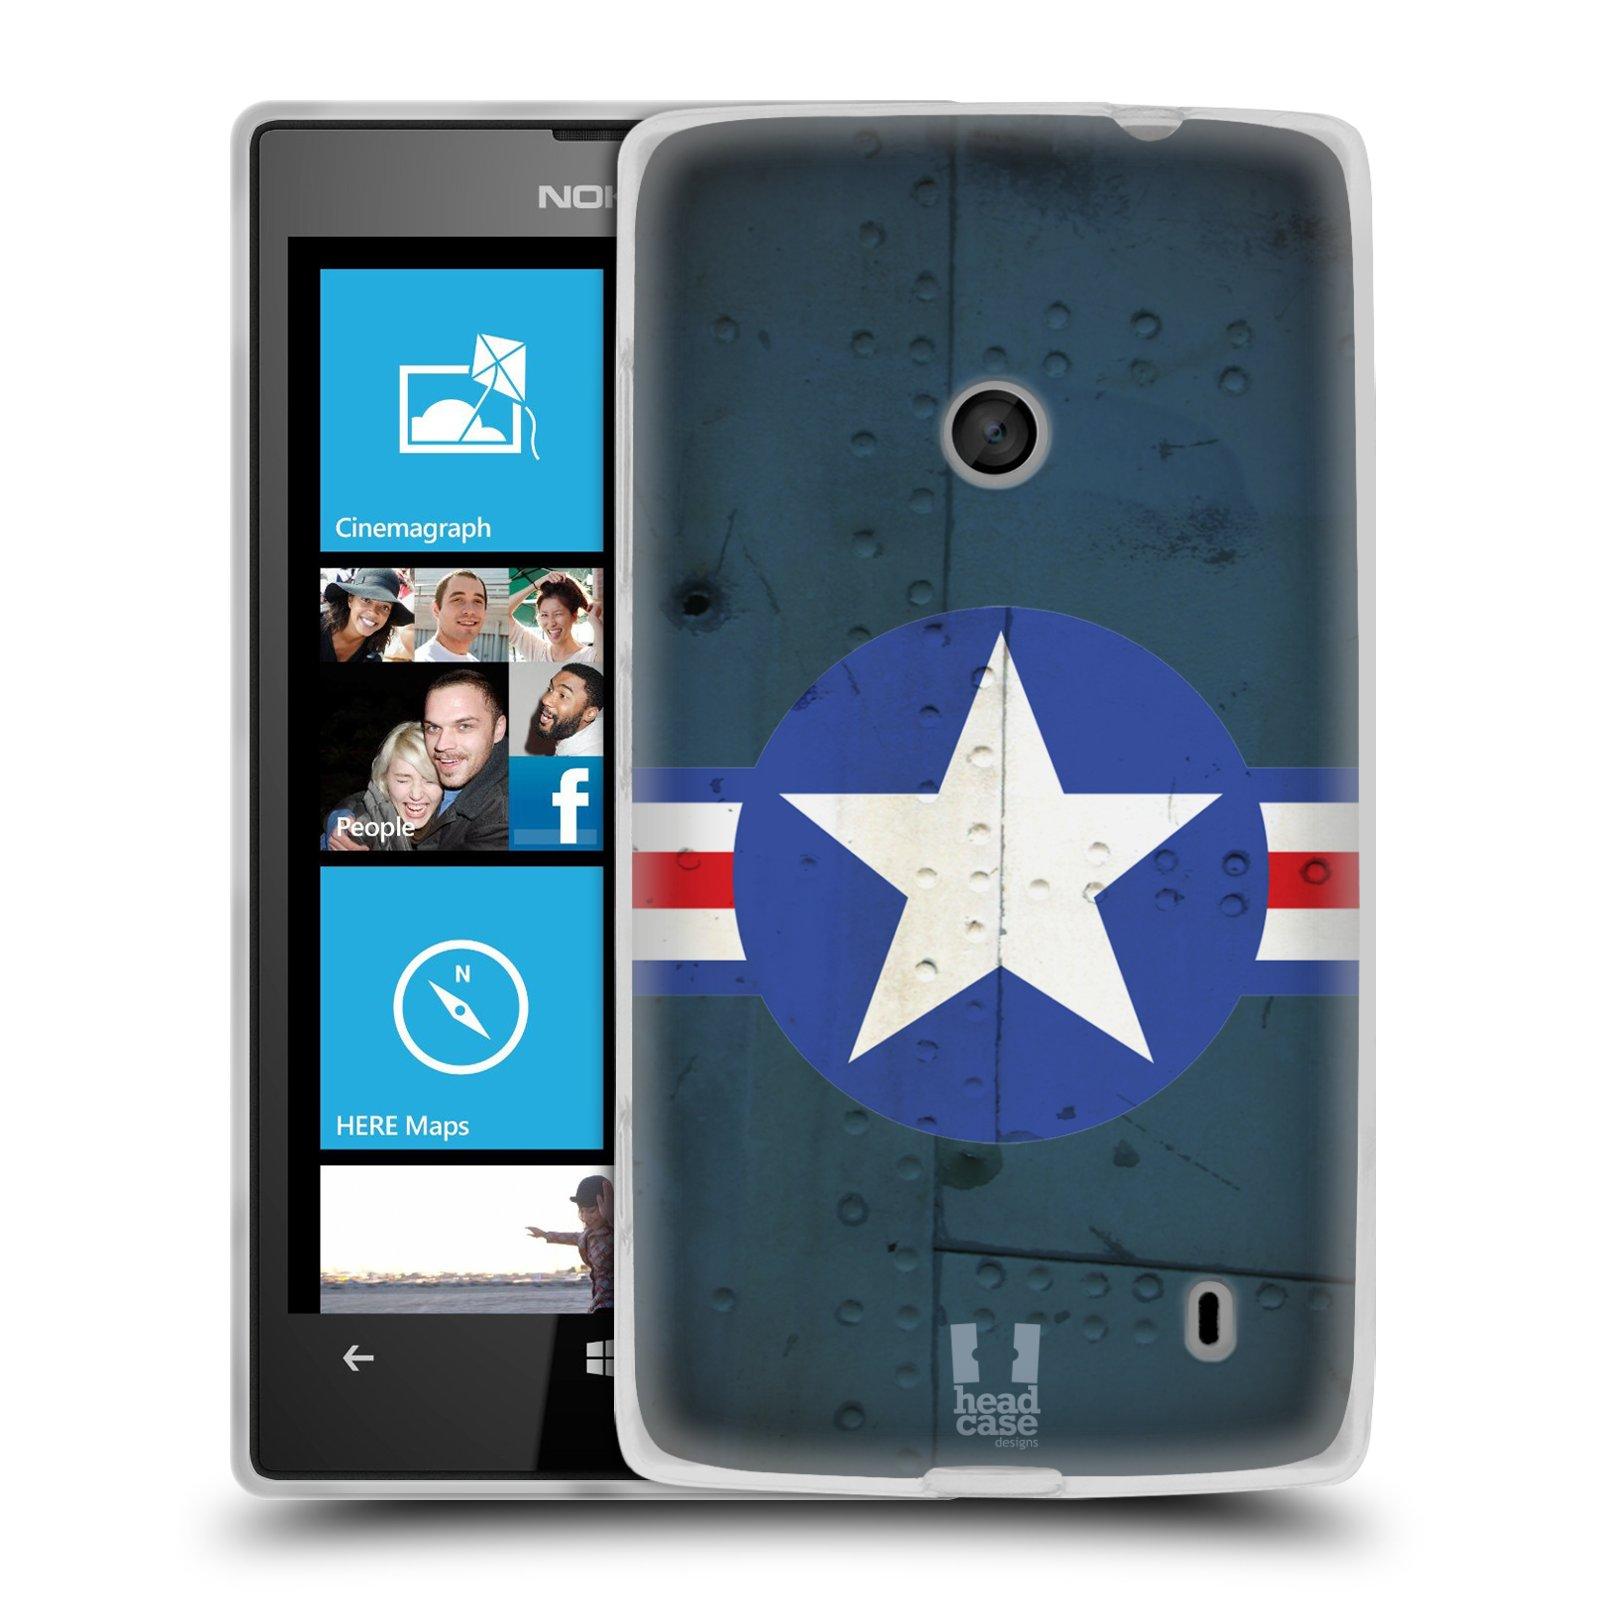 Silikonové pouzdro na mobil Nokia Lumia 520 HEAD CASE POSTWAR (Silikonový Kryt či obal na mobilní telefon Nokia Lumia 520)